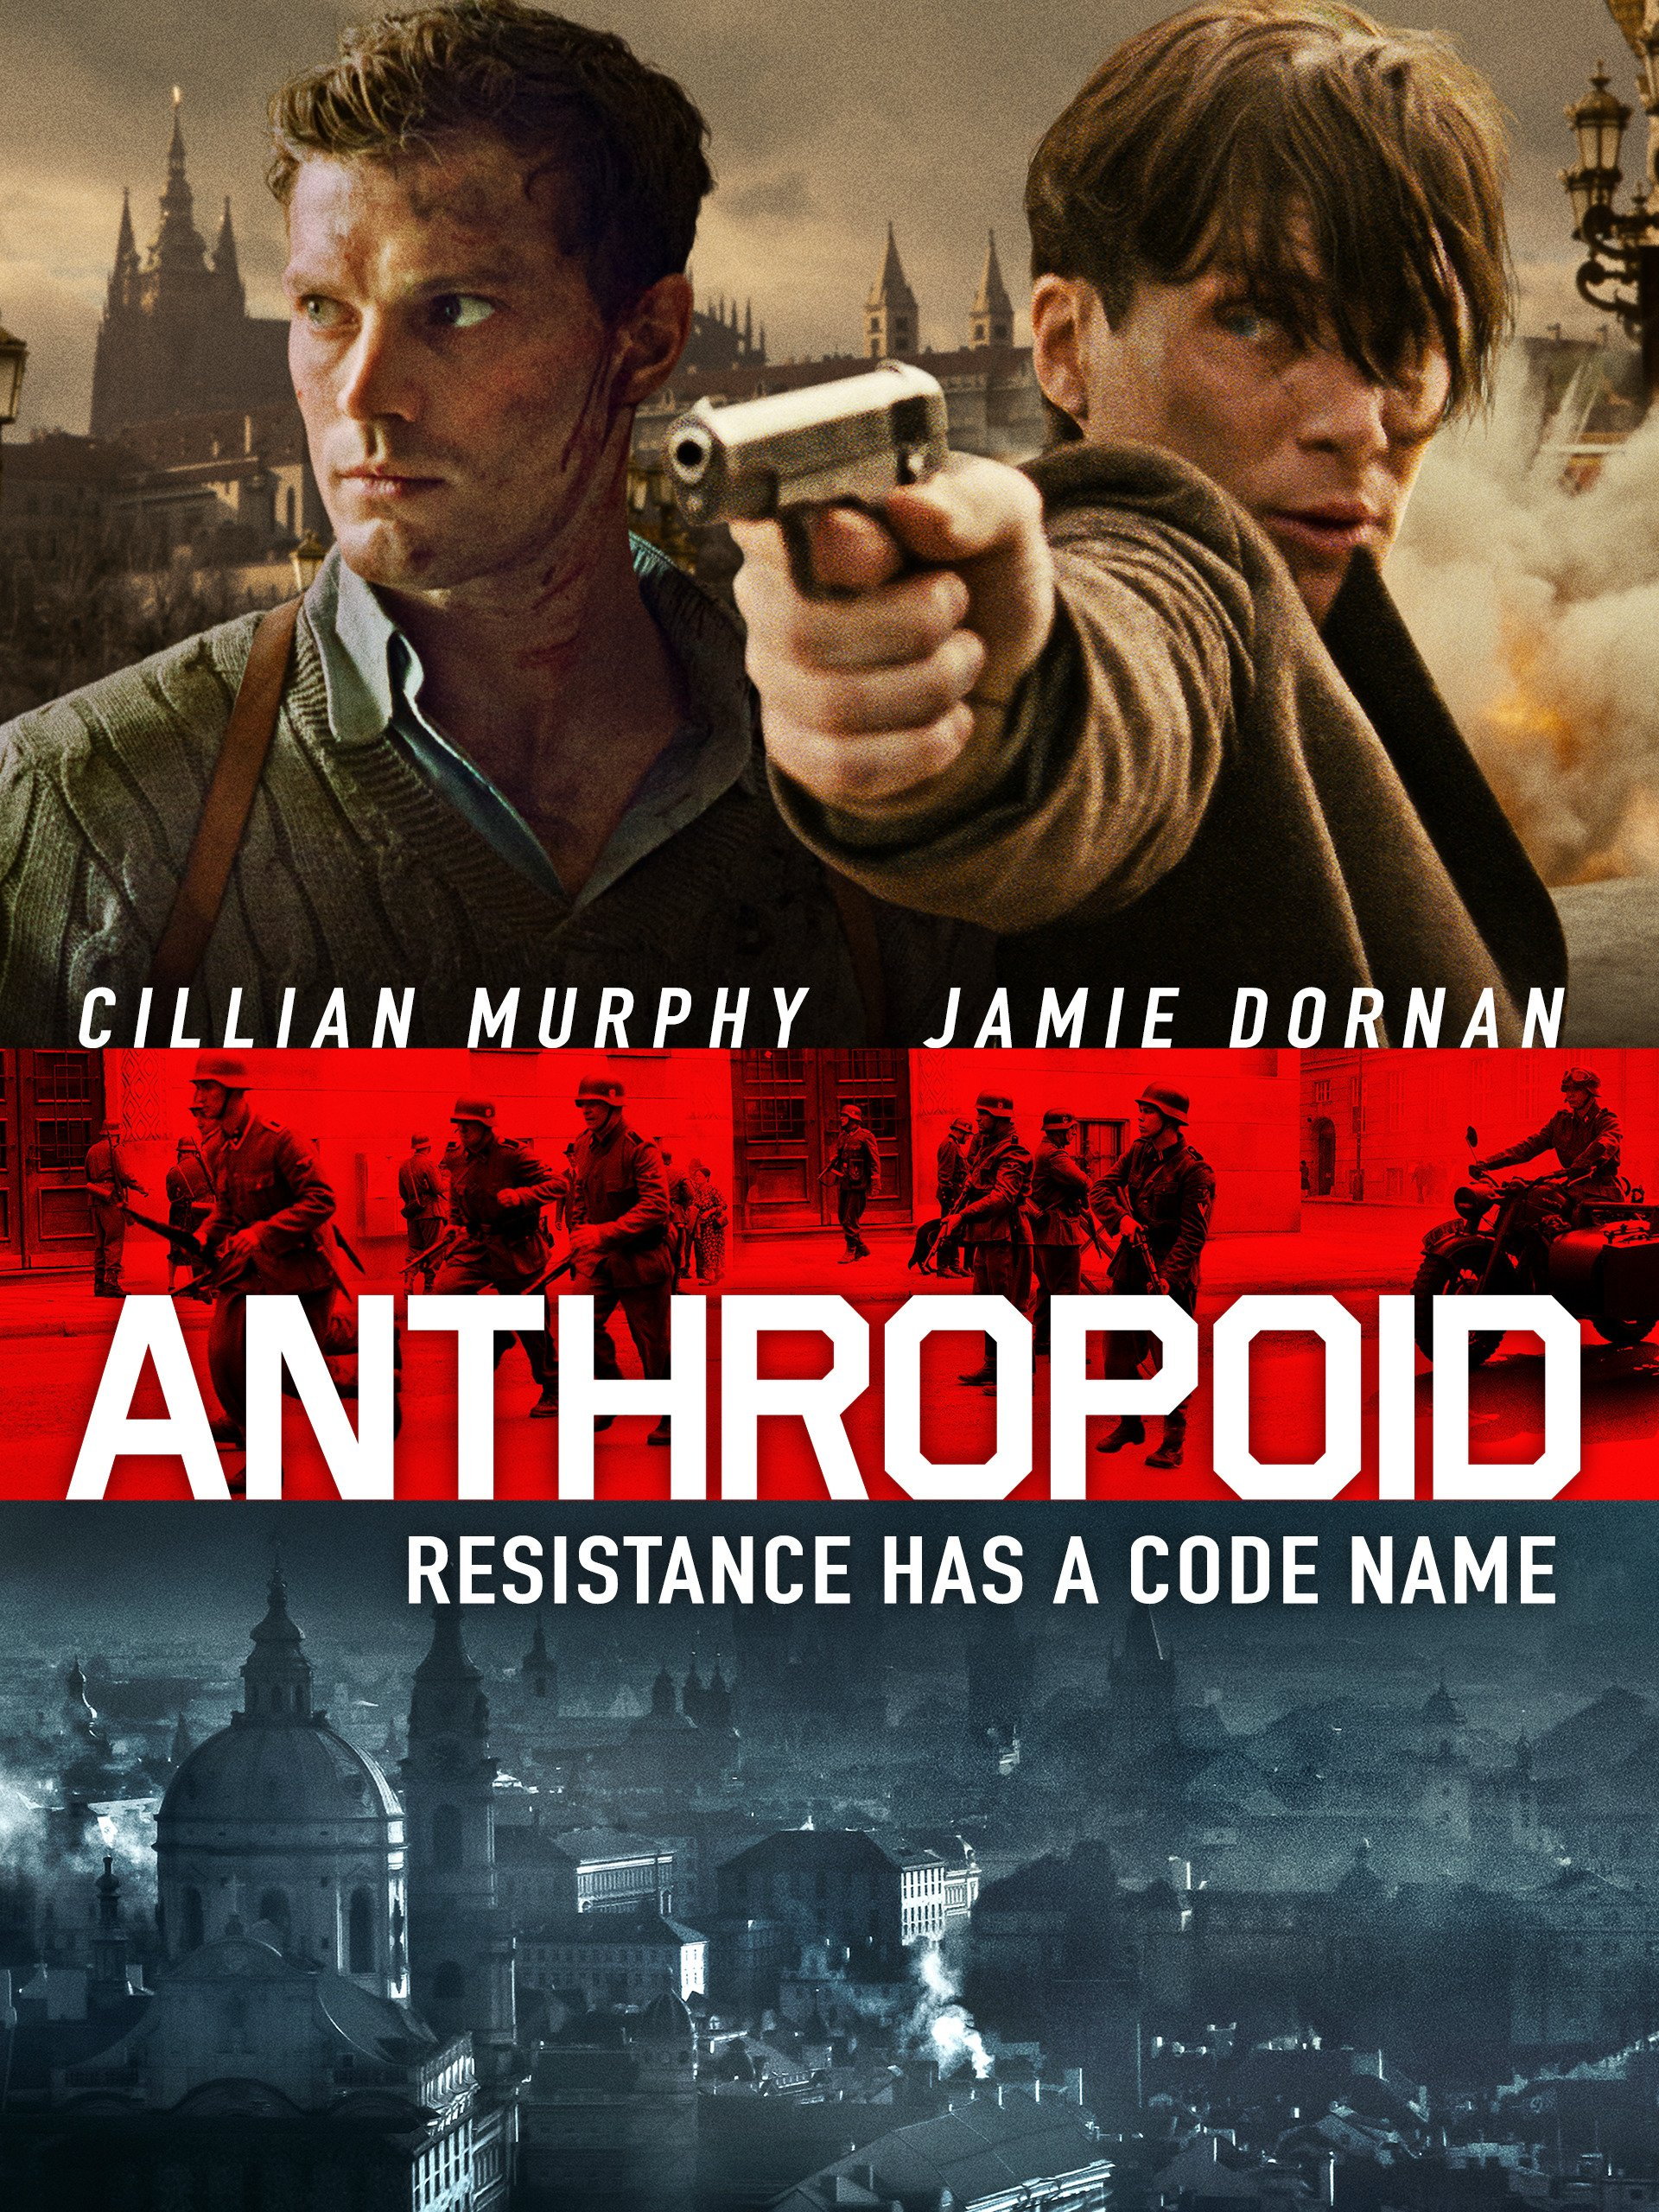 Amazon.com: Anthropoid: Cillian Murphy, Jamie Dornan, Charlotte Le Bon, Anna Geislerova: Amazon Digital Services LLC